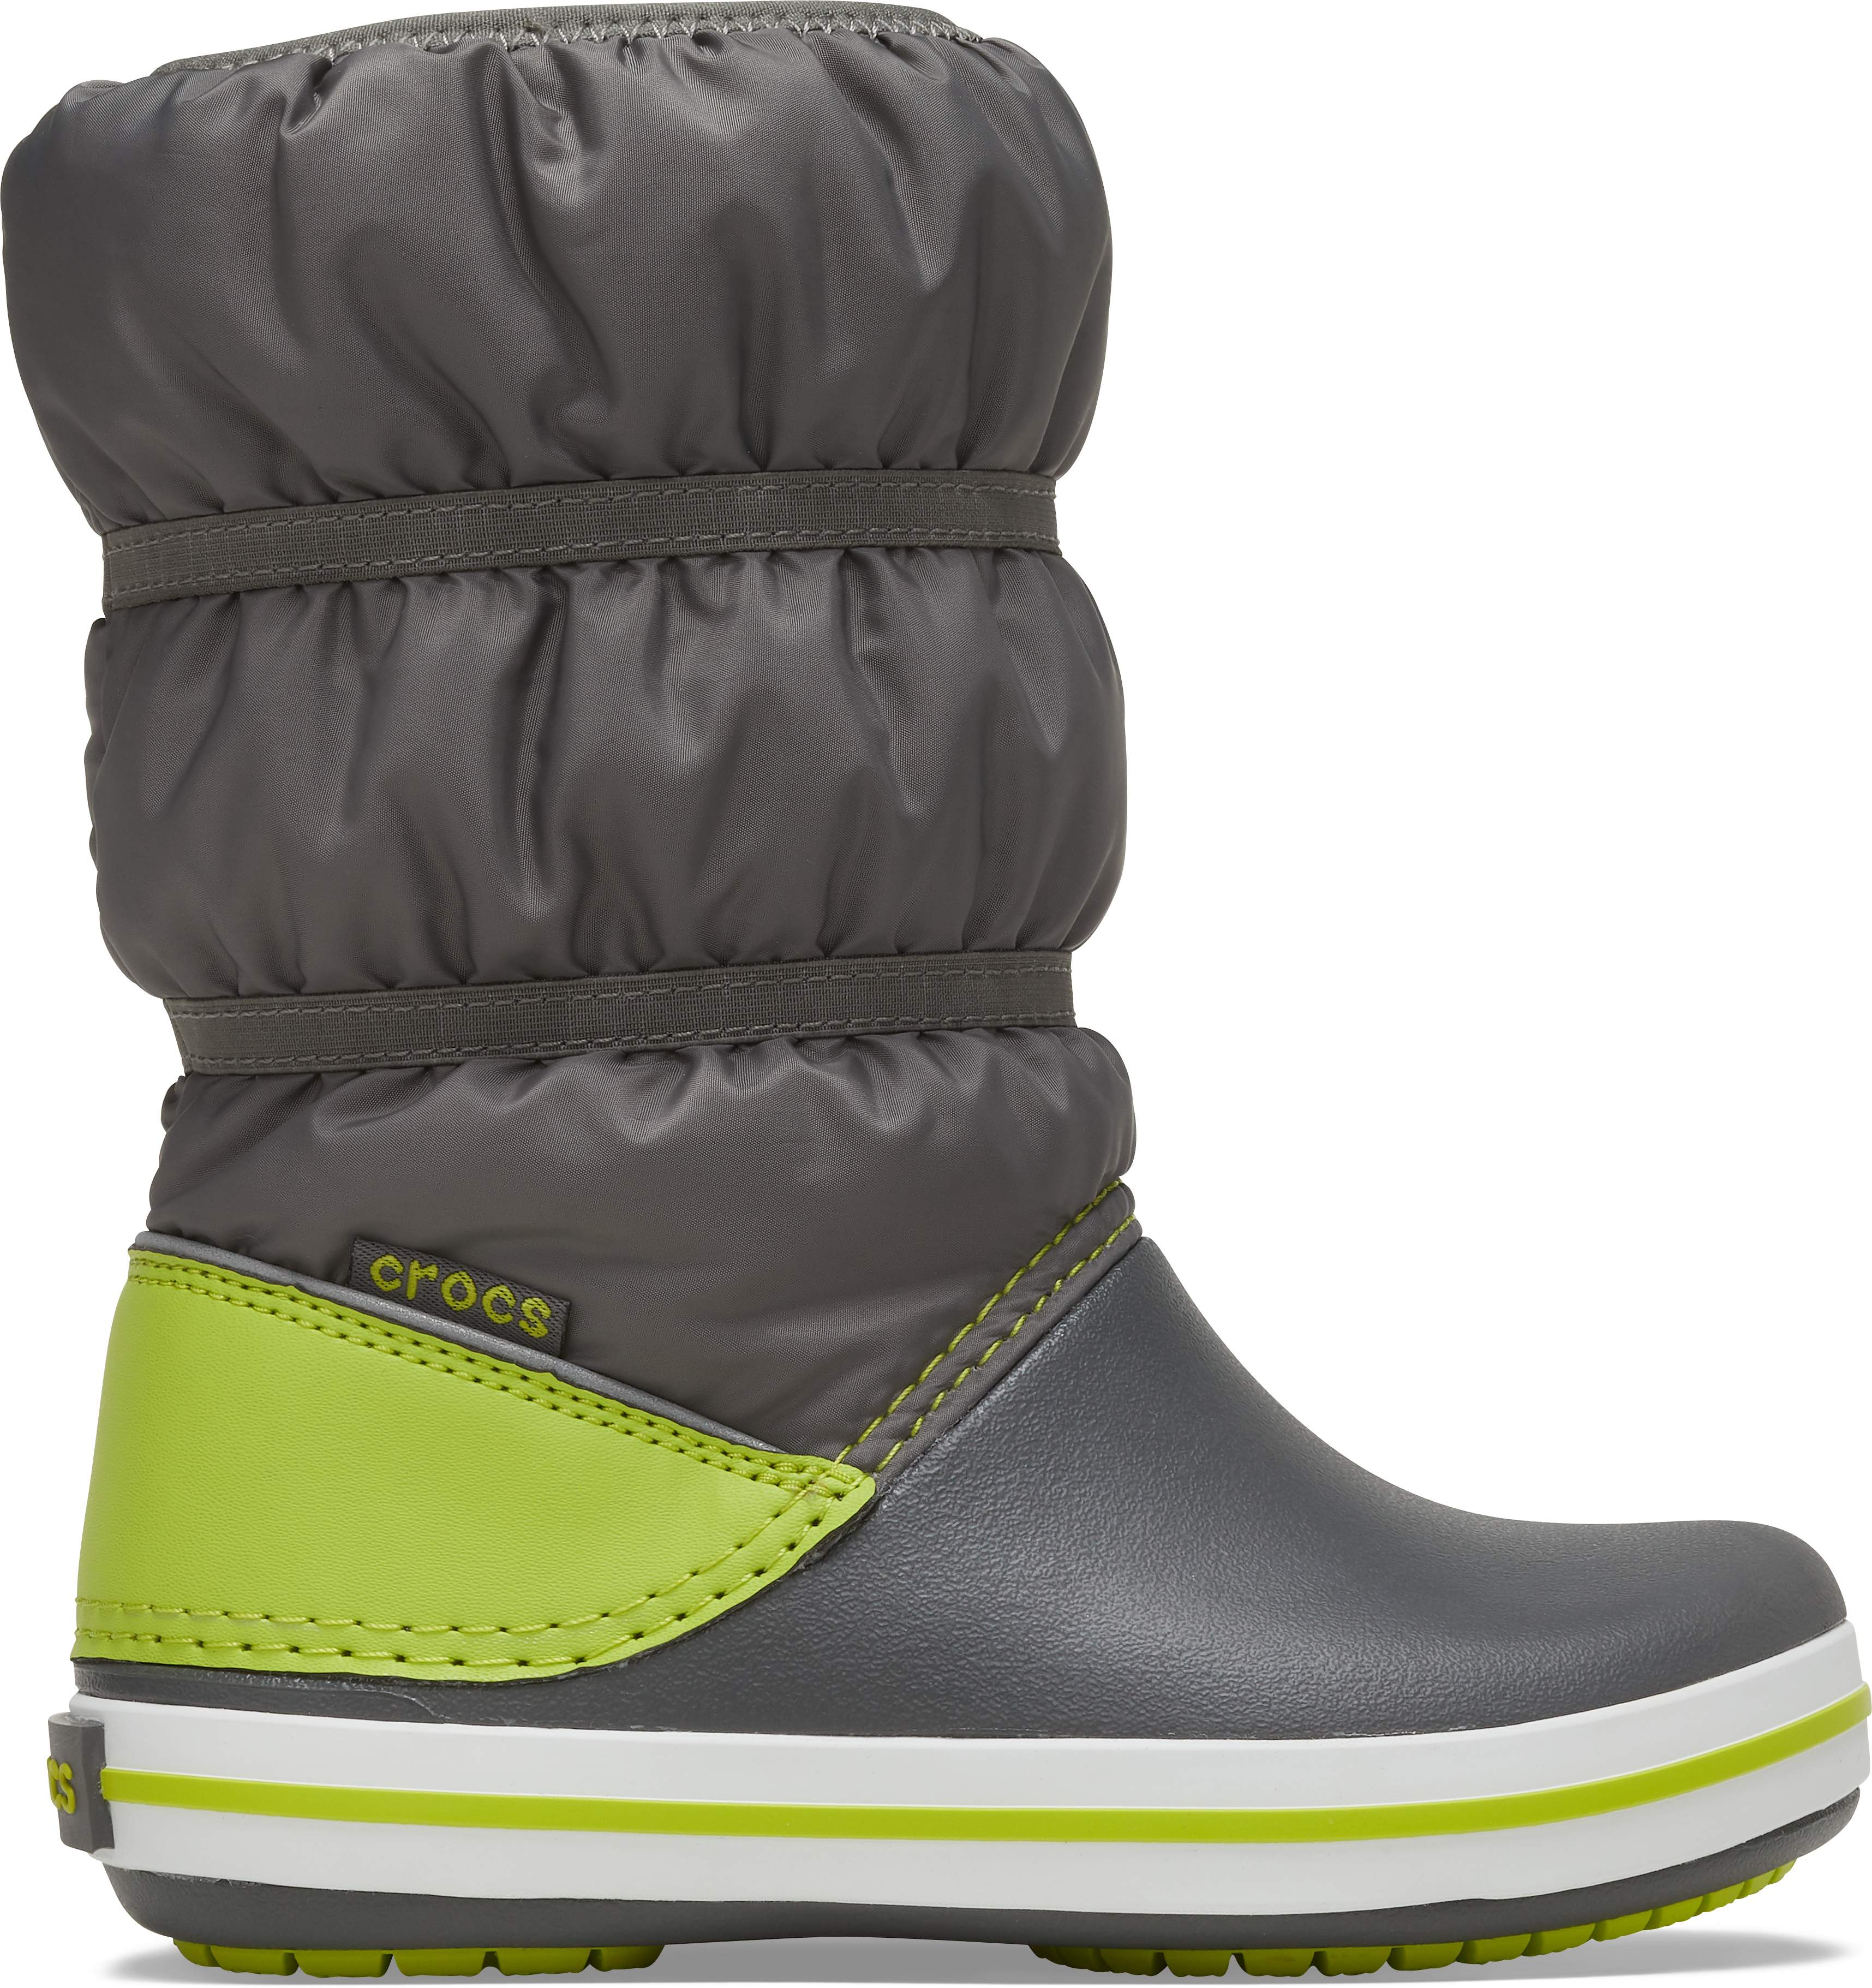 Army Green//Slate Grey Crocs Crocband Rain Boot Kids